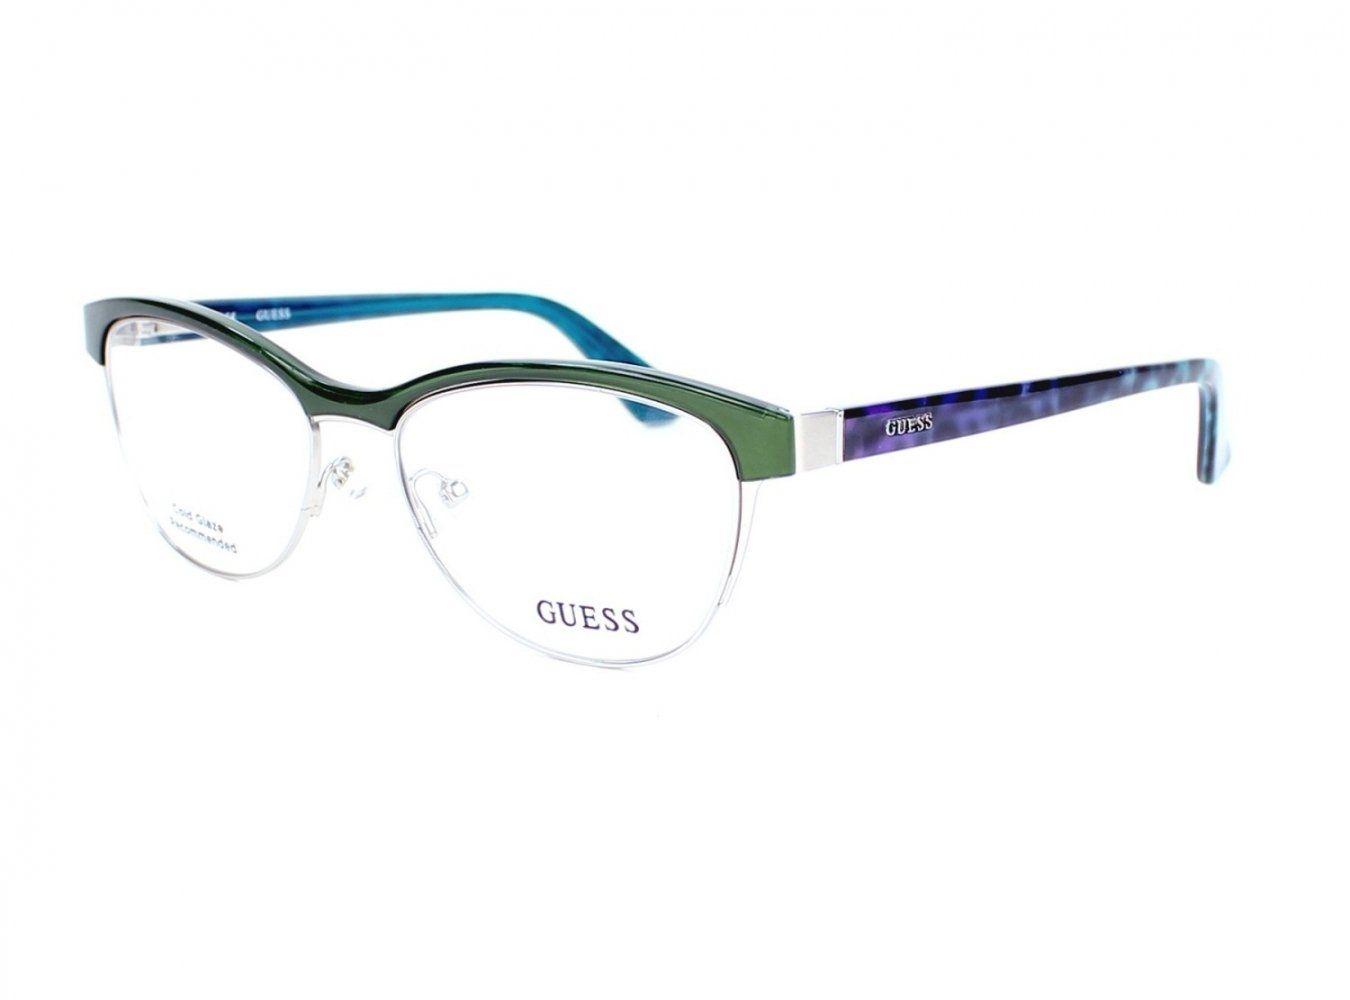 44287a2872881 Optical frame Guess Plastic Green - Blue (GU2523 098). Female style. Frame